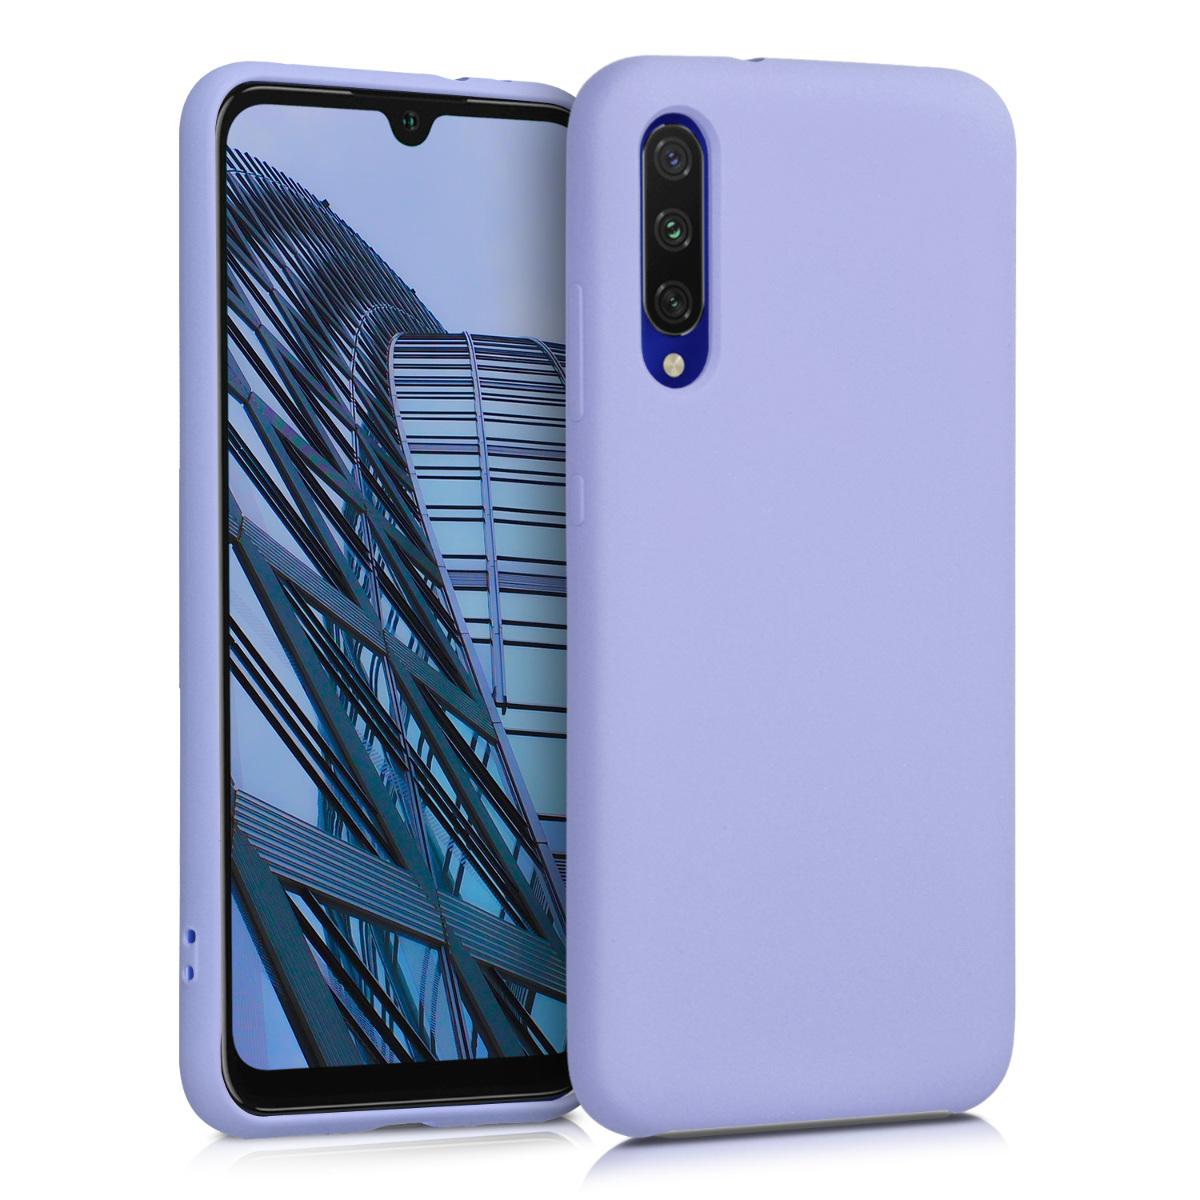 KW Θήκη Σιλικόνης Xiaomi Mi A3 - Soft Flexible Rubber - Lavender (49680.108)